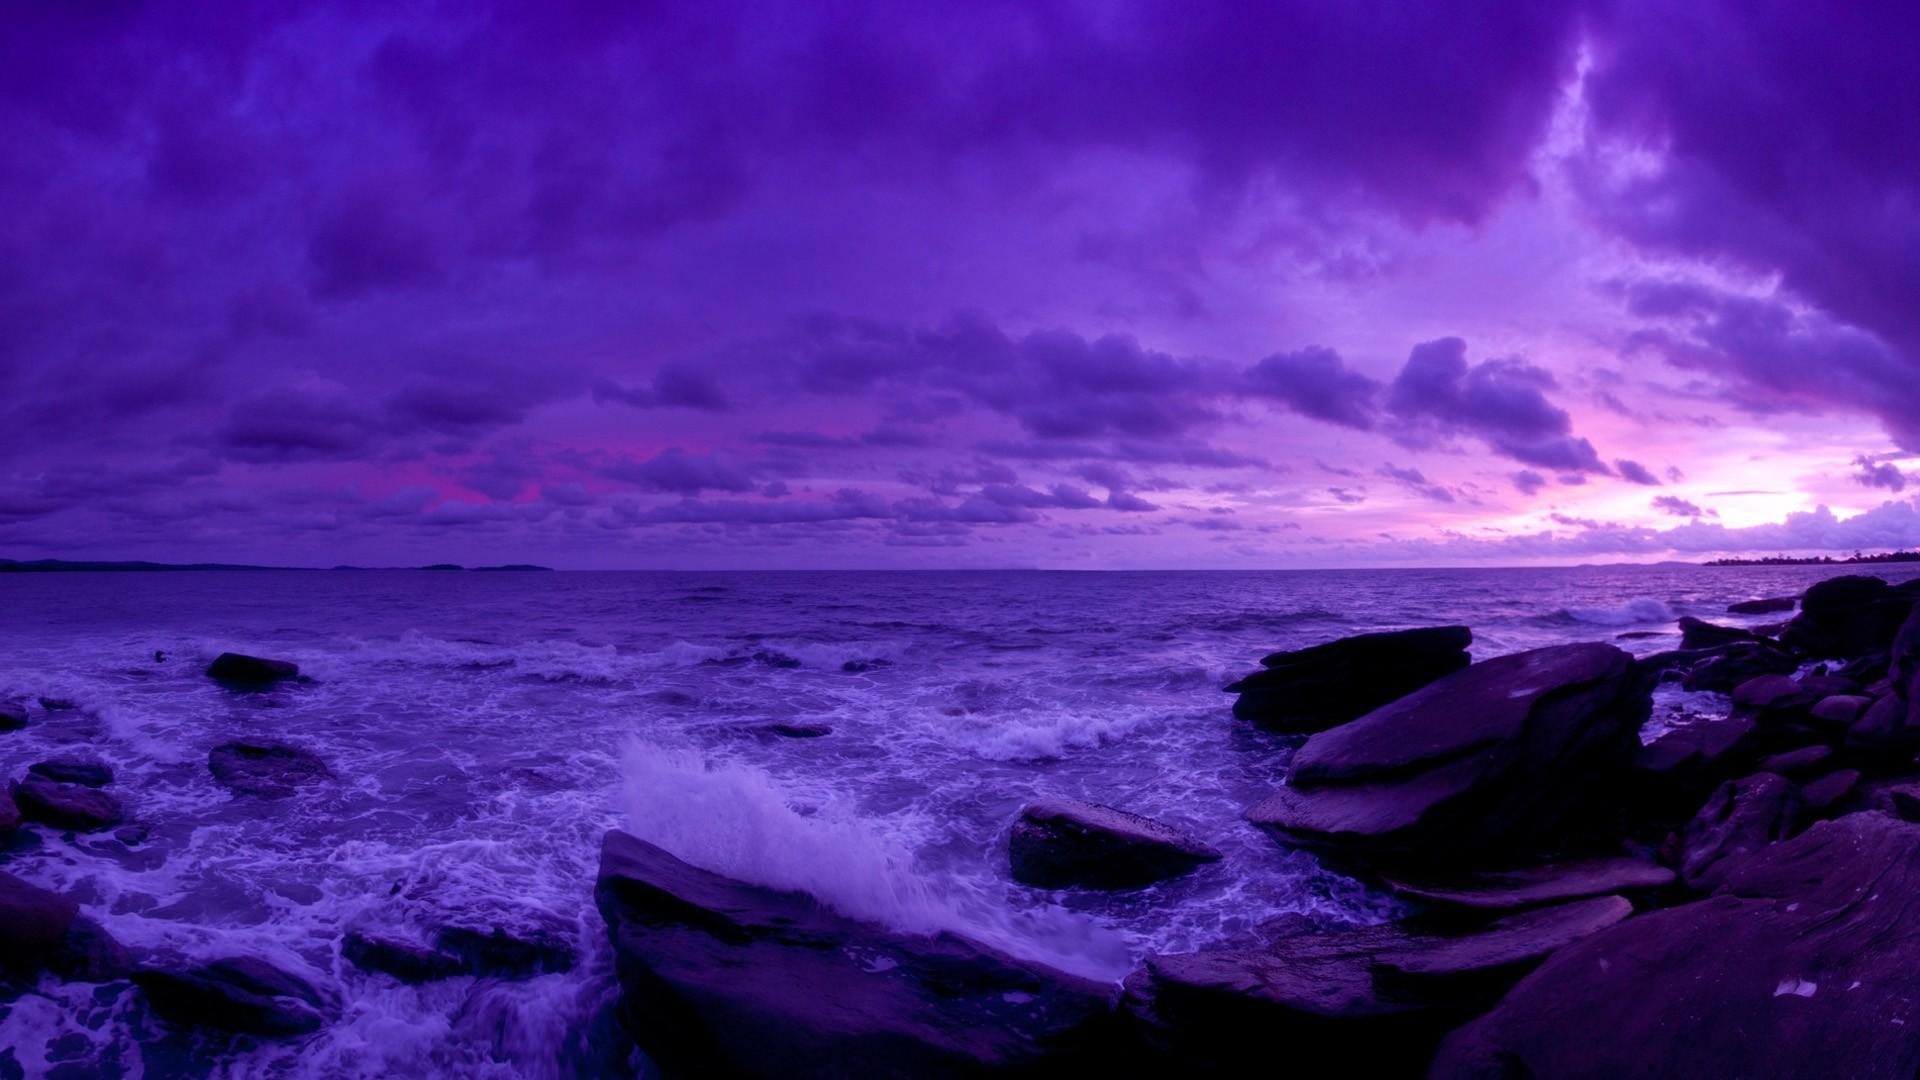 Purple Sunset full hd wallpaper